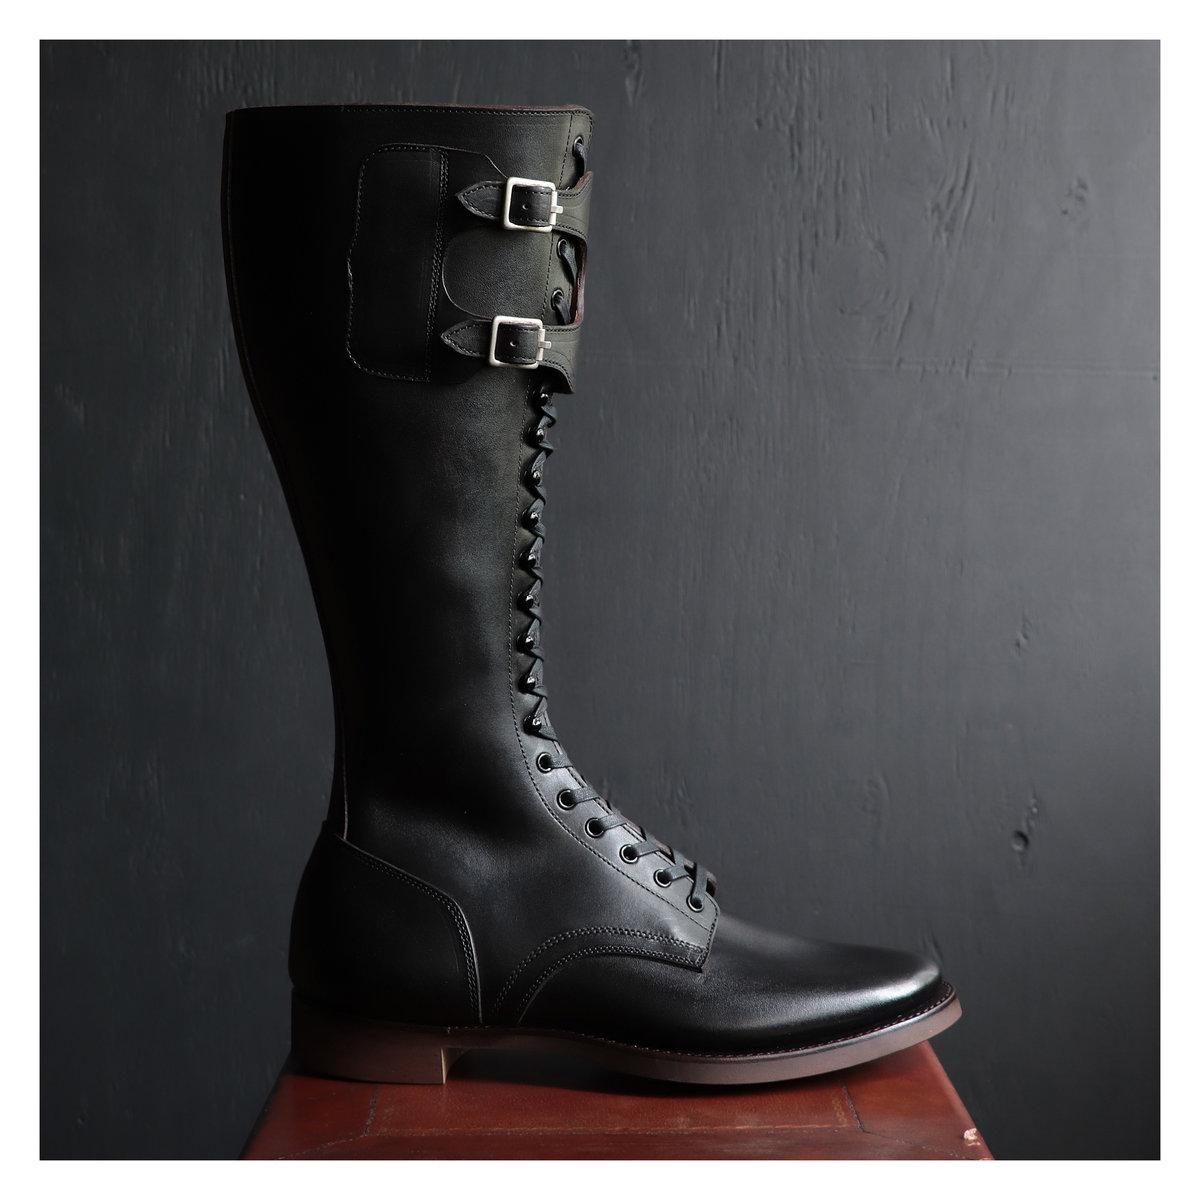 BS x Clinch - Transcontinental Boots - Flat-17.jpg